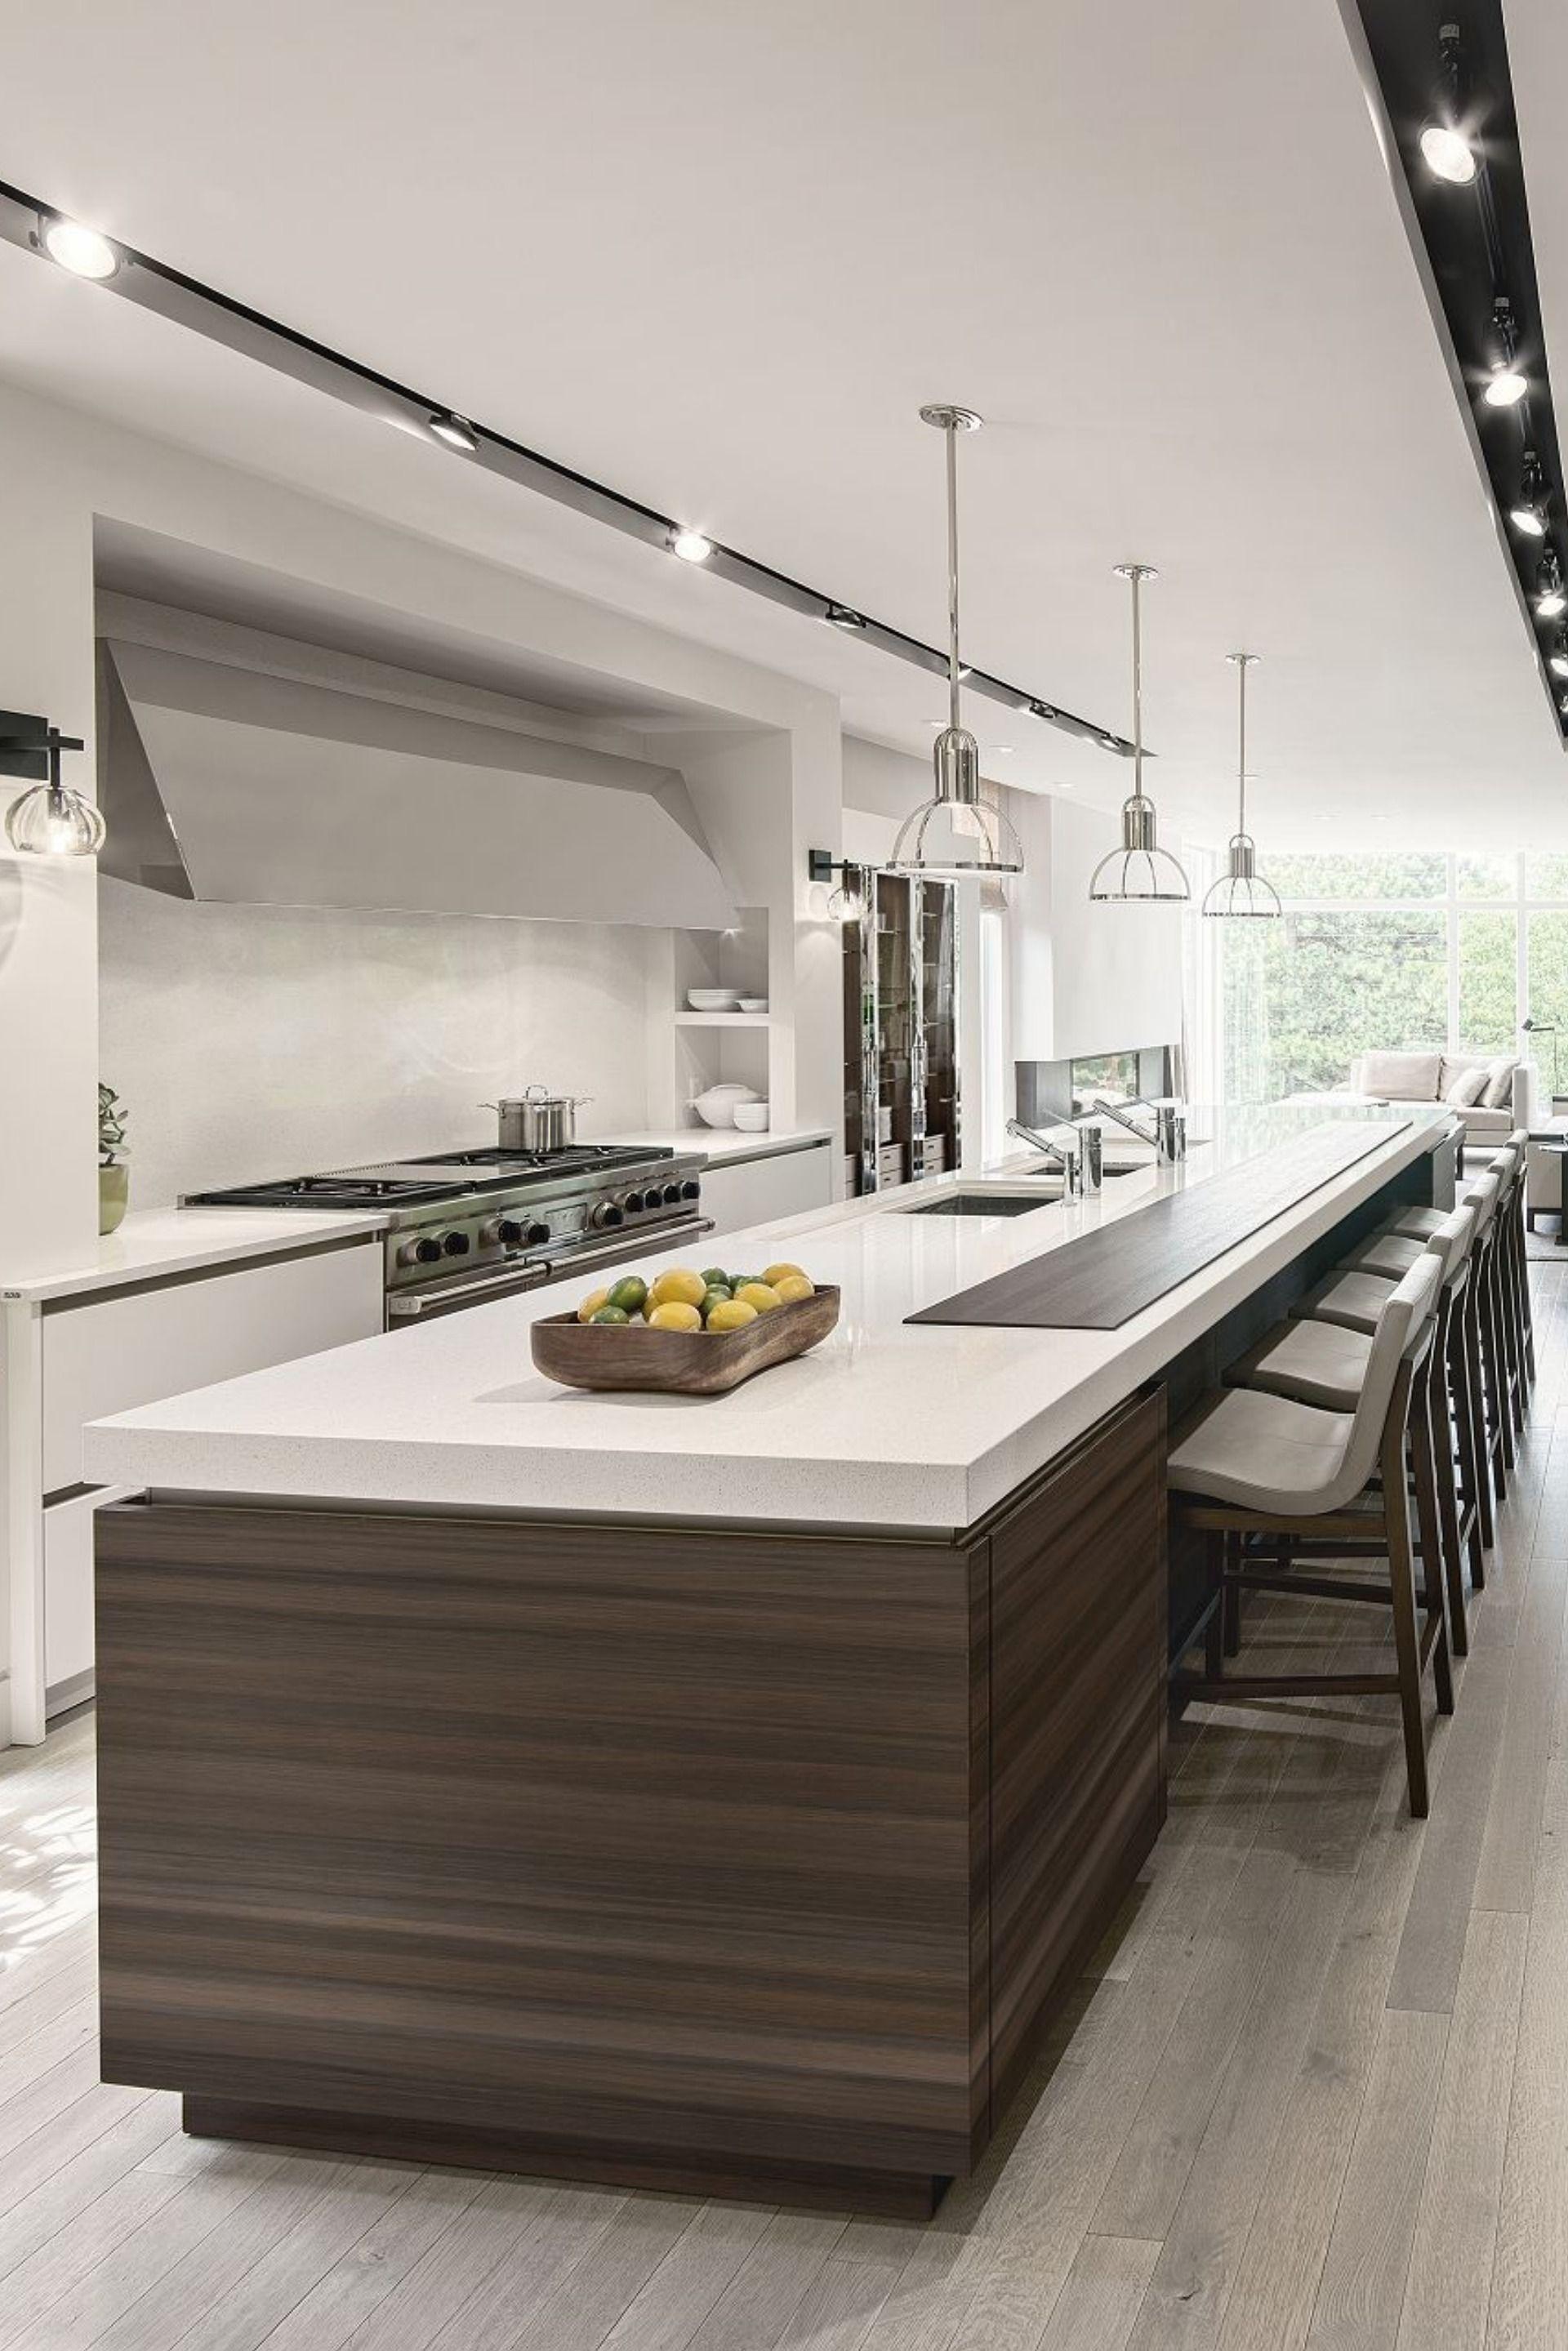 Own The Kitchen You Deserve Siematic Uk In 2020 Elegant Living Living Spaces Elegant Design